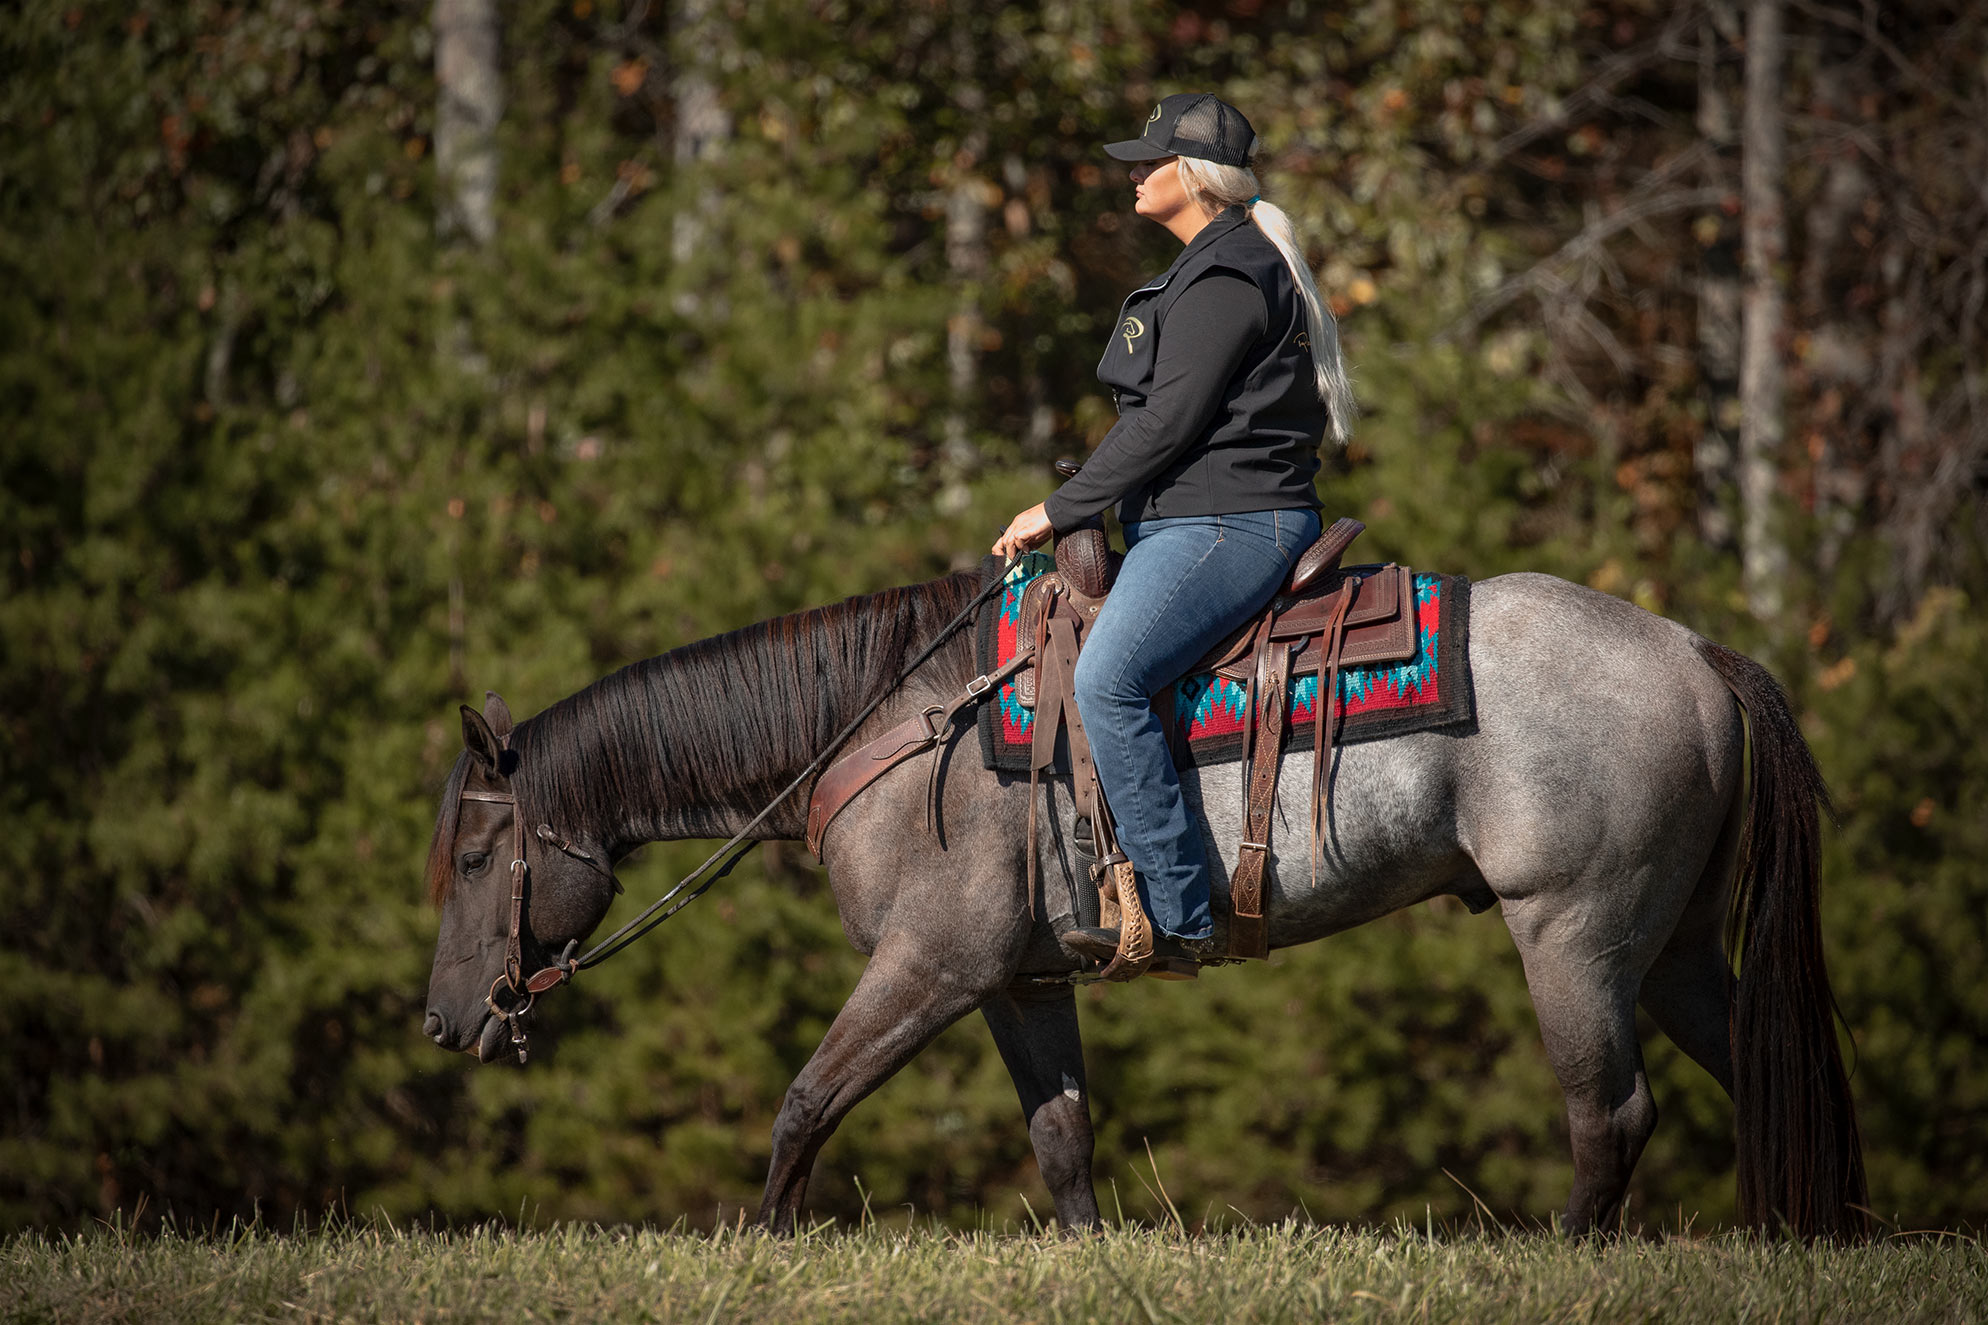 010-Gunsmoke-Luxury-Trail-Horse-For-Sale